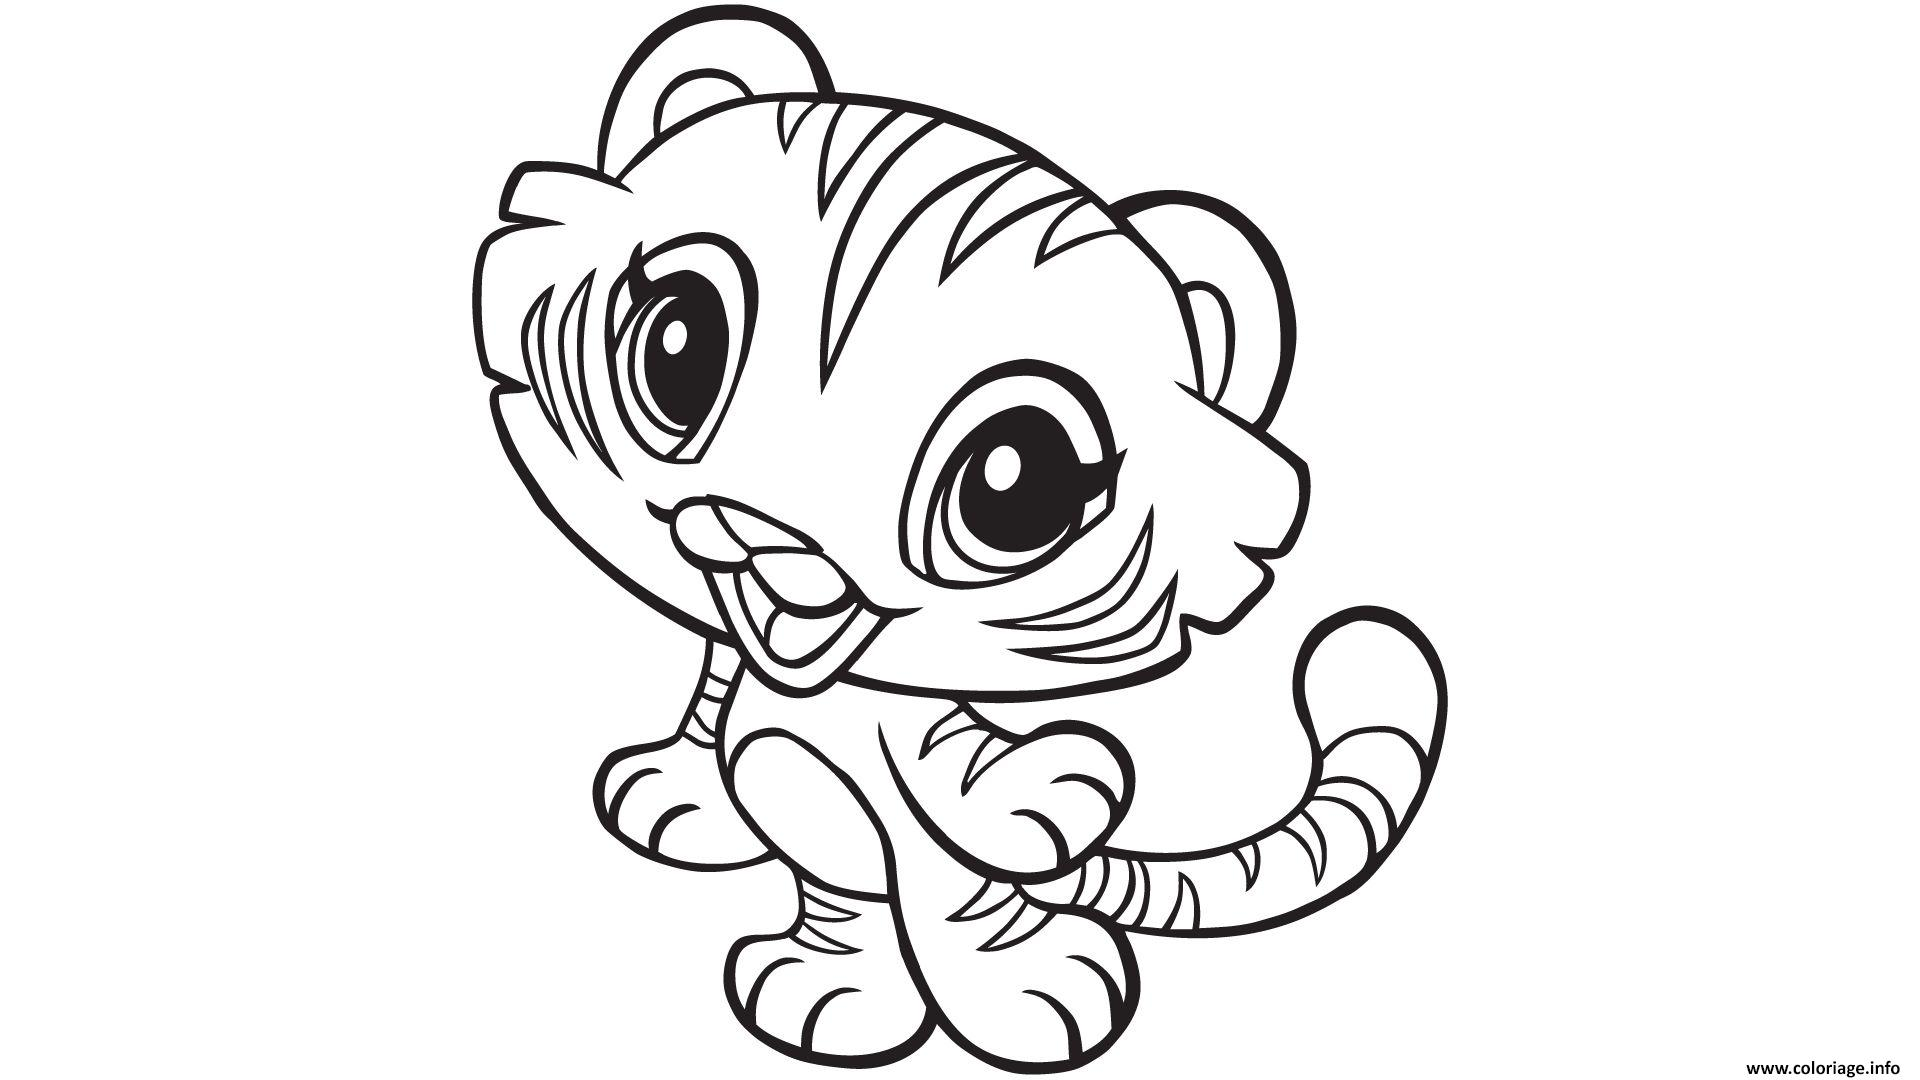 Coloriage Kawaii Animaux Tigre Dessin